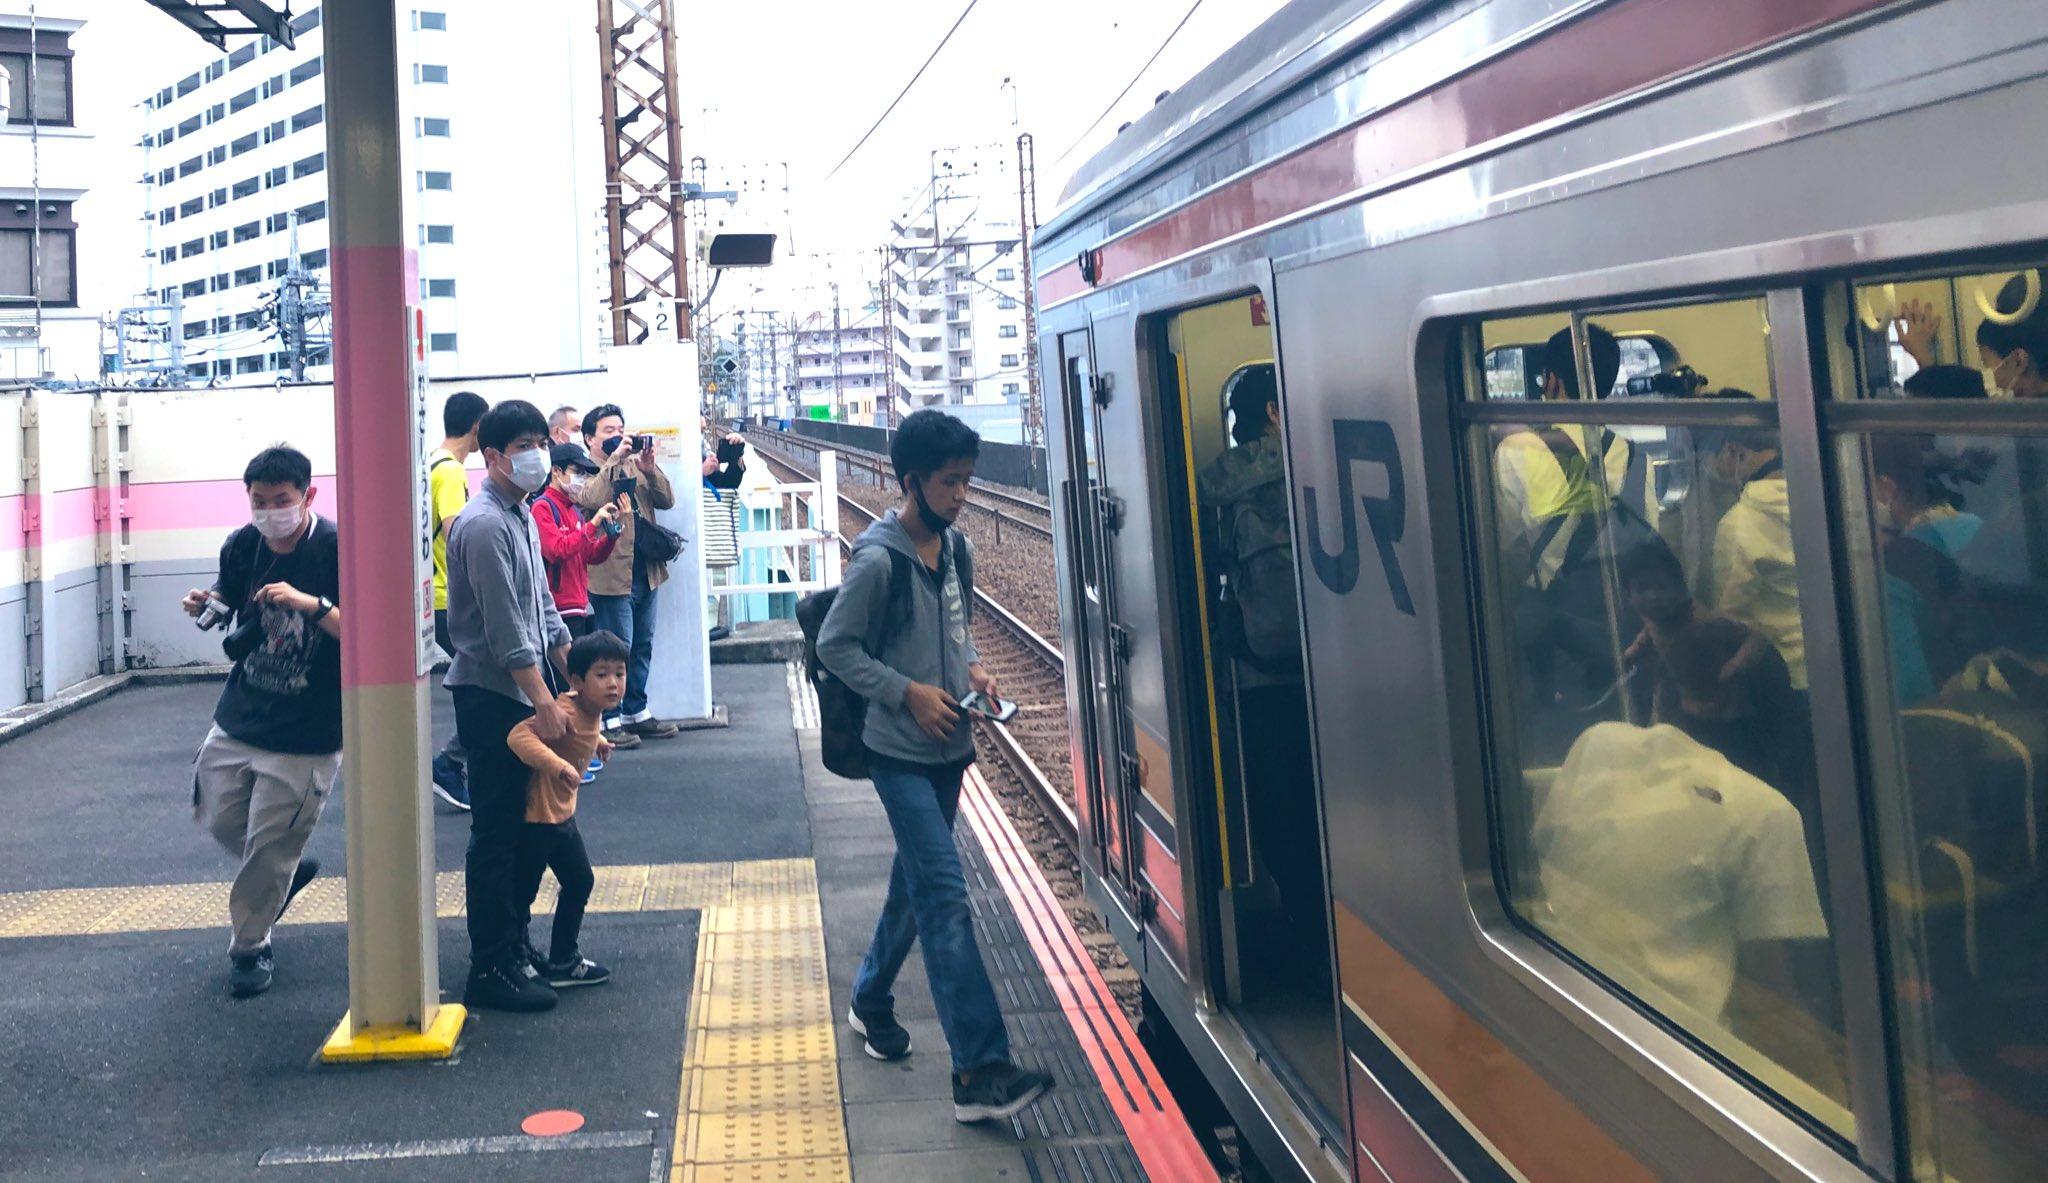 【M17編成離脱】武蔵野線205系は残り1編成 撮影を巡り各地では騒ぎになり「走る動物園」状態